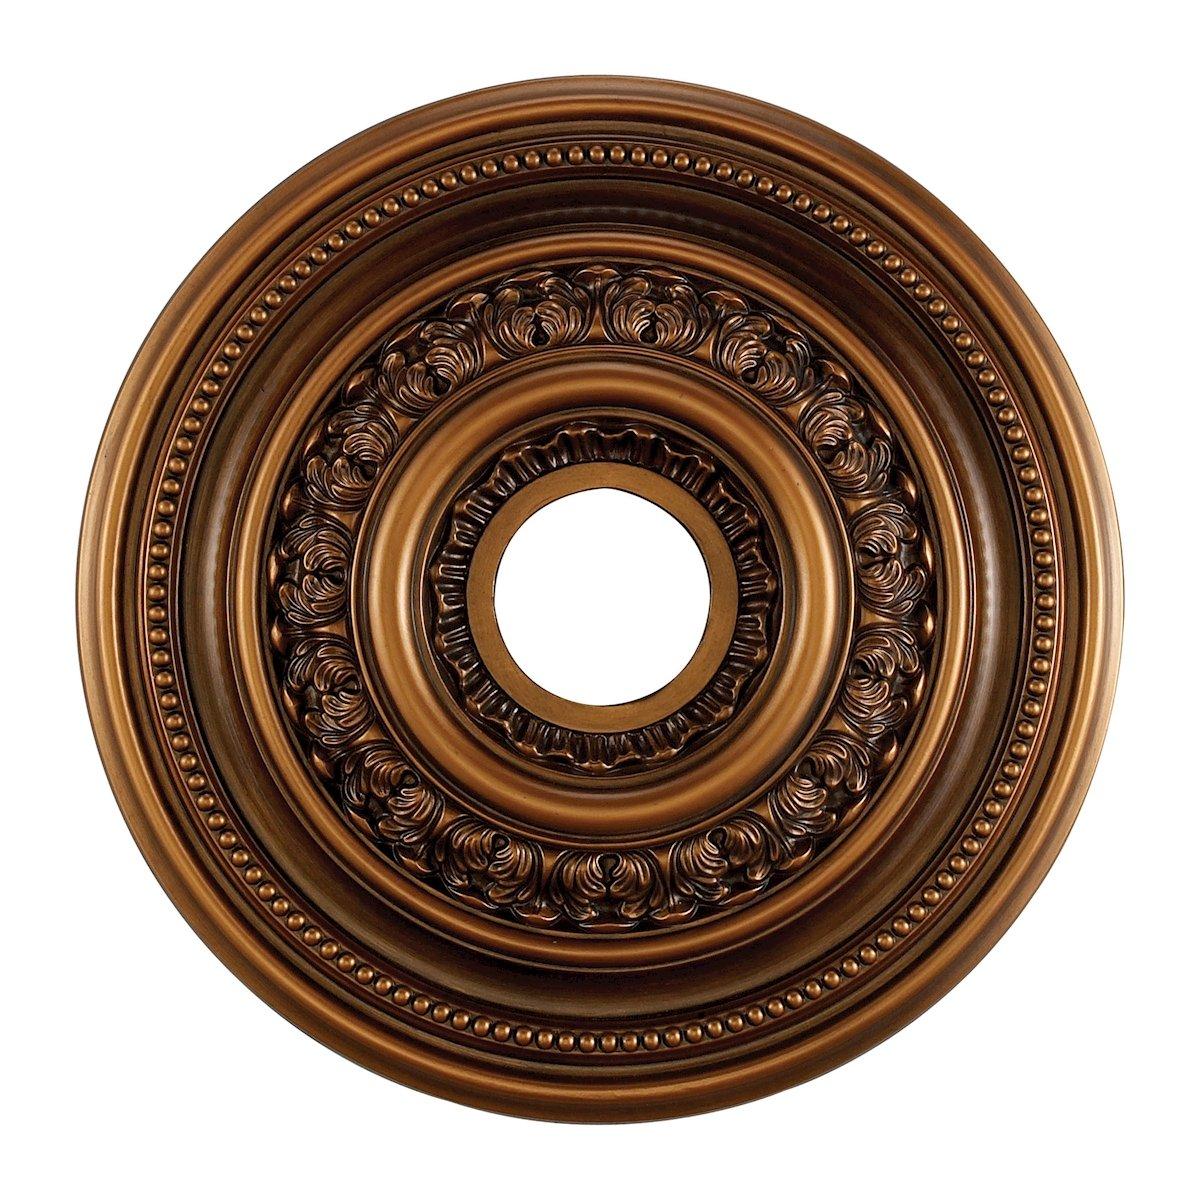 English Study Medallion 18 Inch In Antique Bronze Finish